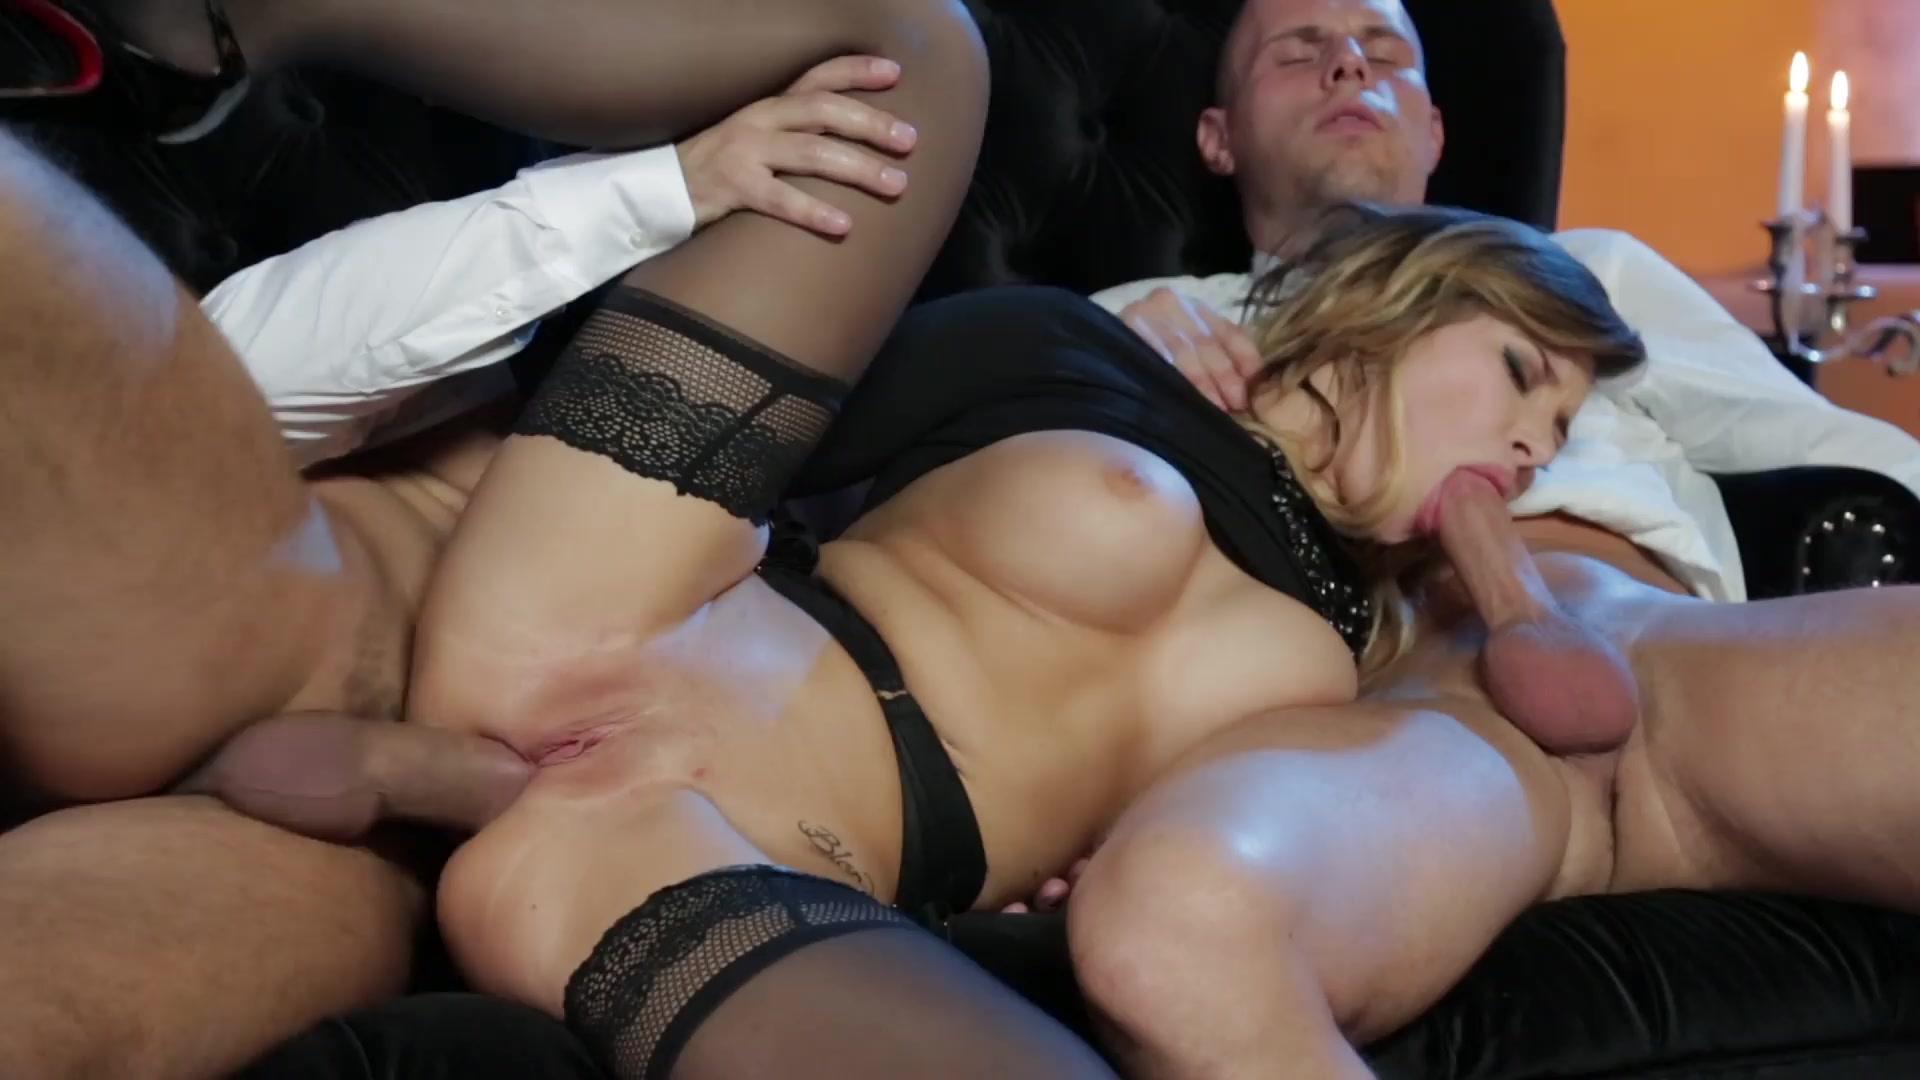 porno-filmi-luchshee-ot-polini-telka-postoyanno-konchaet